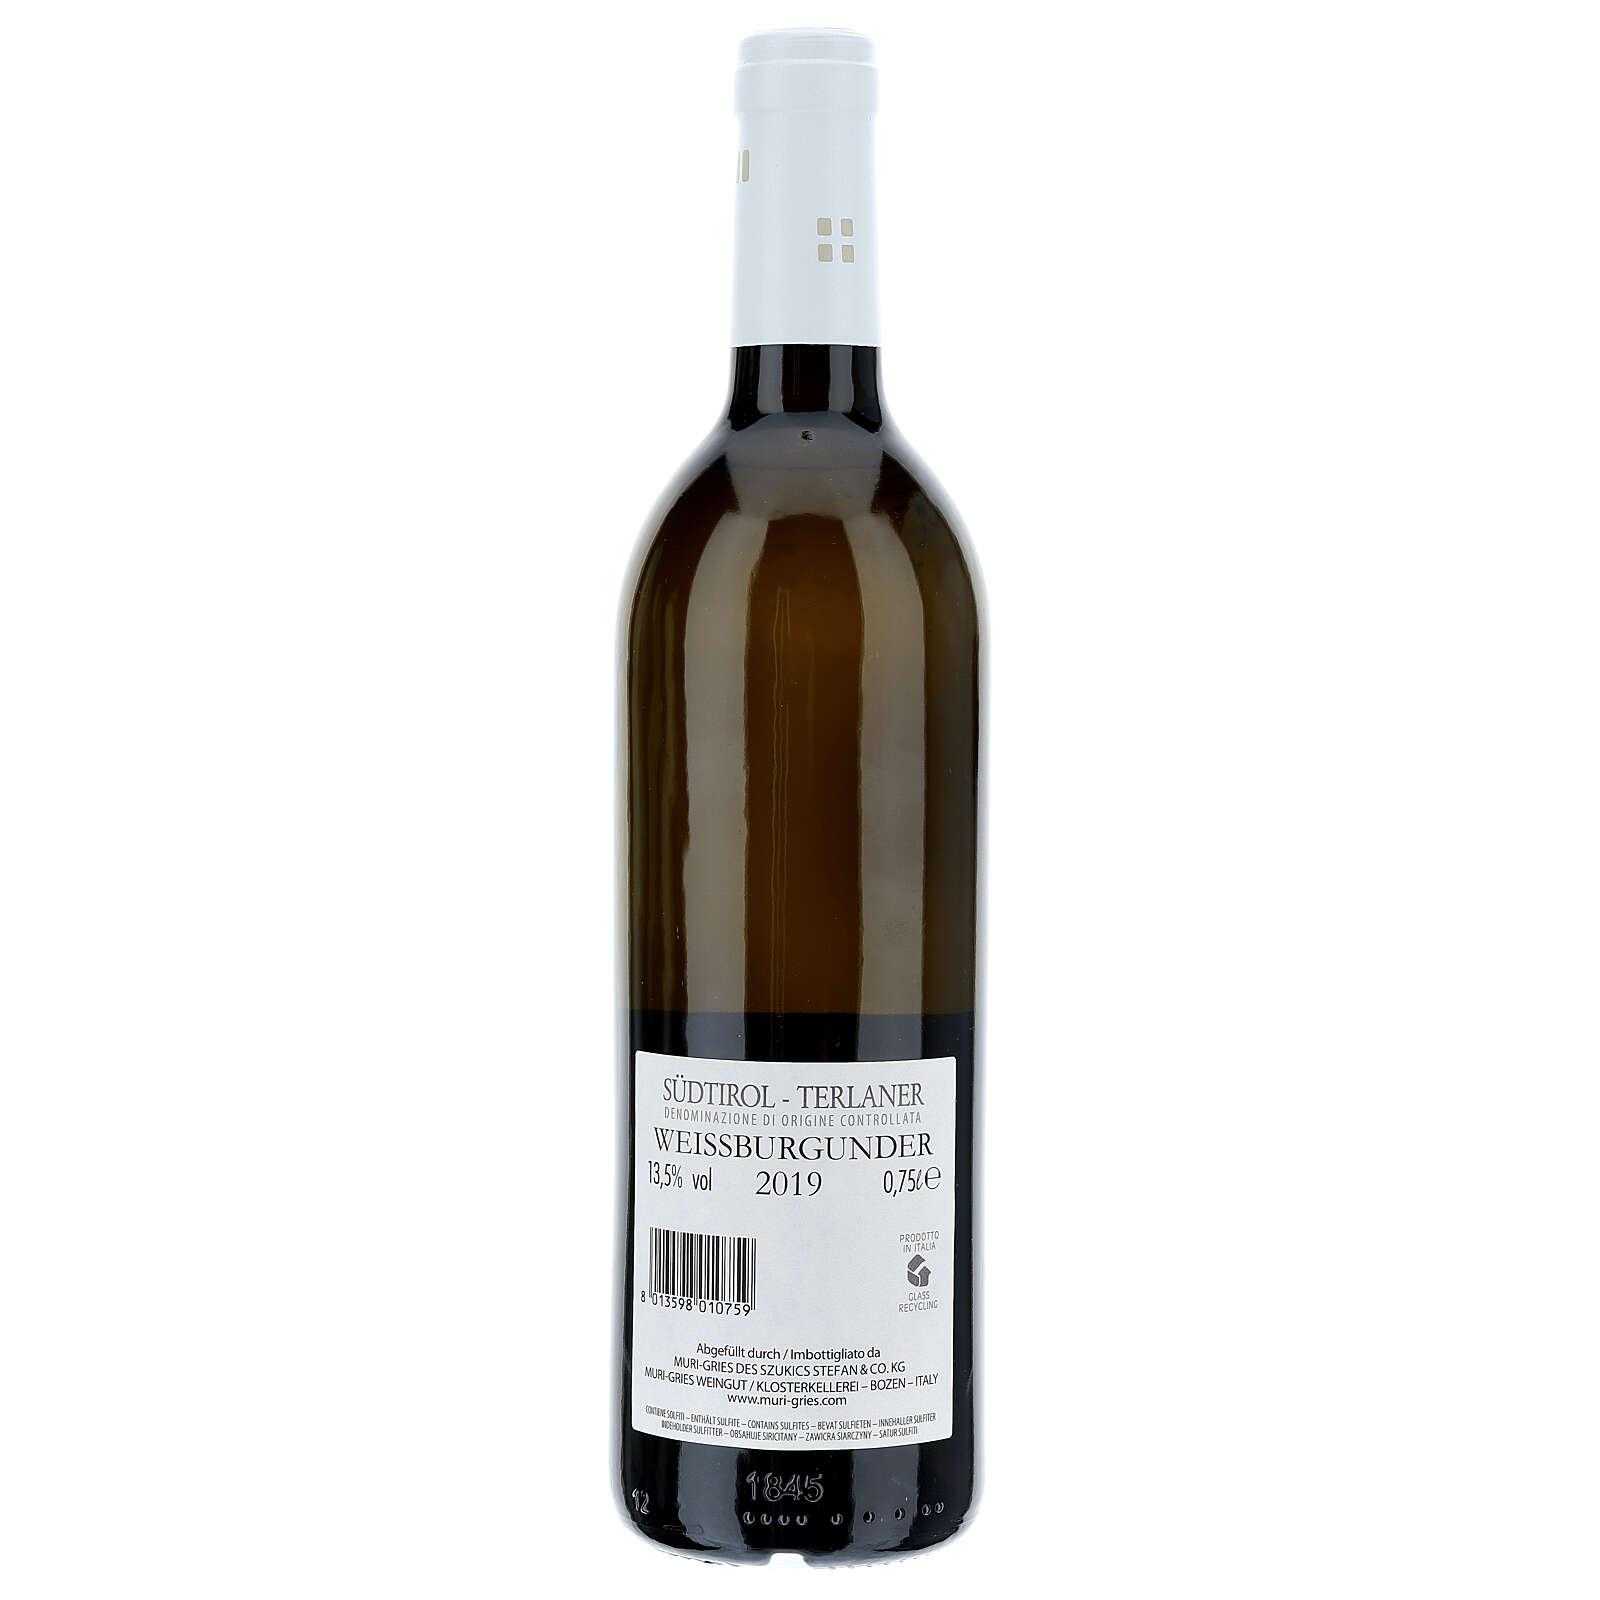 Vin Pinot blanc de Terlano DOC 2019  Abbaye Muri Gries 3